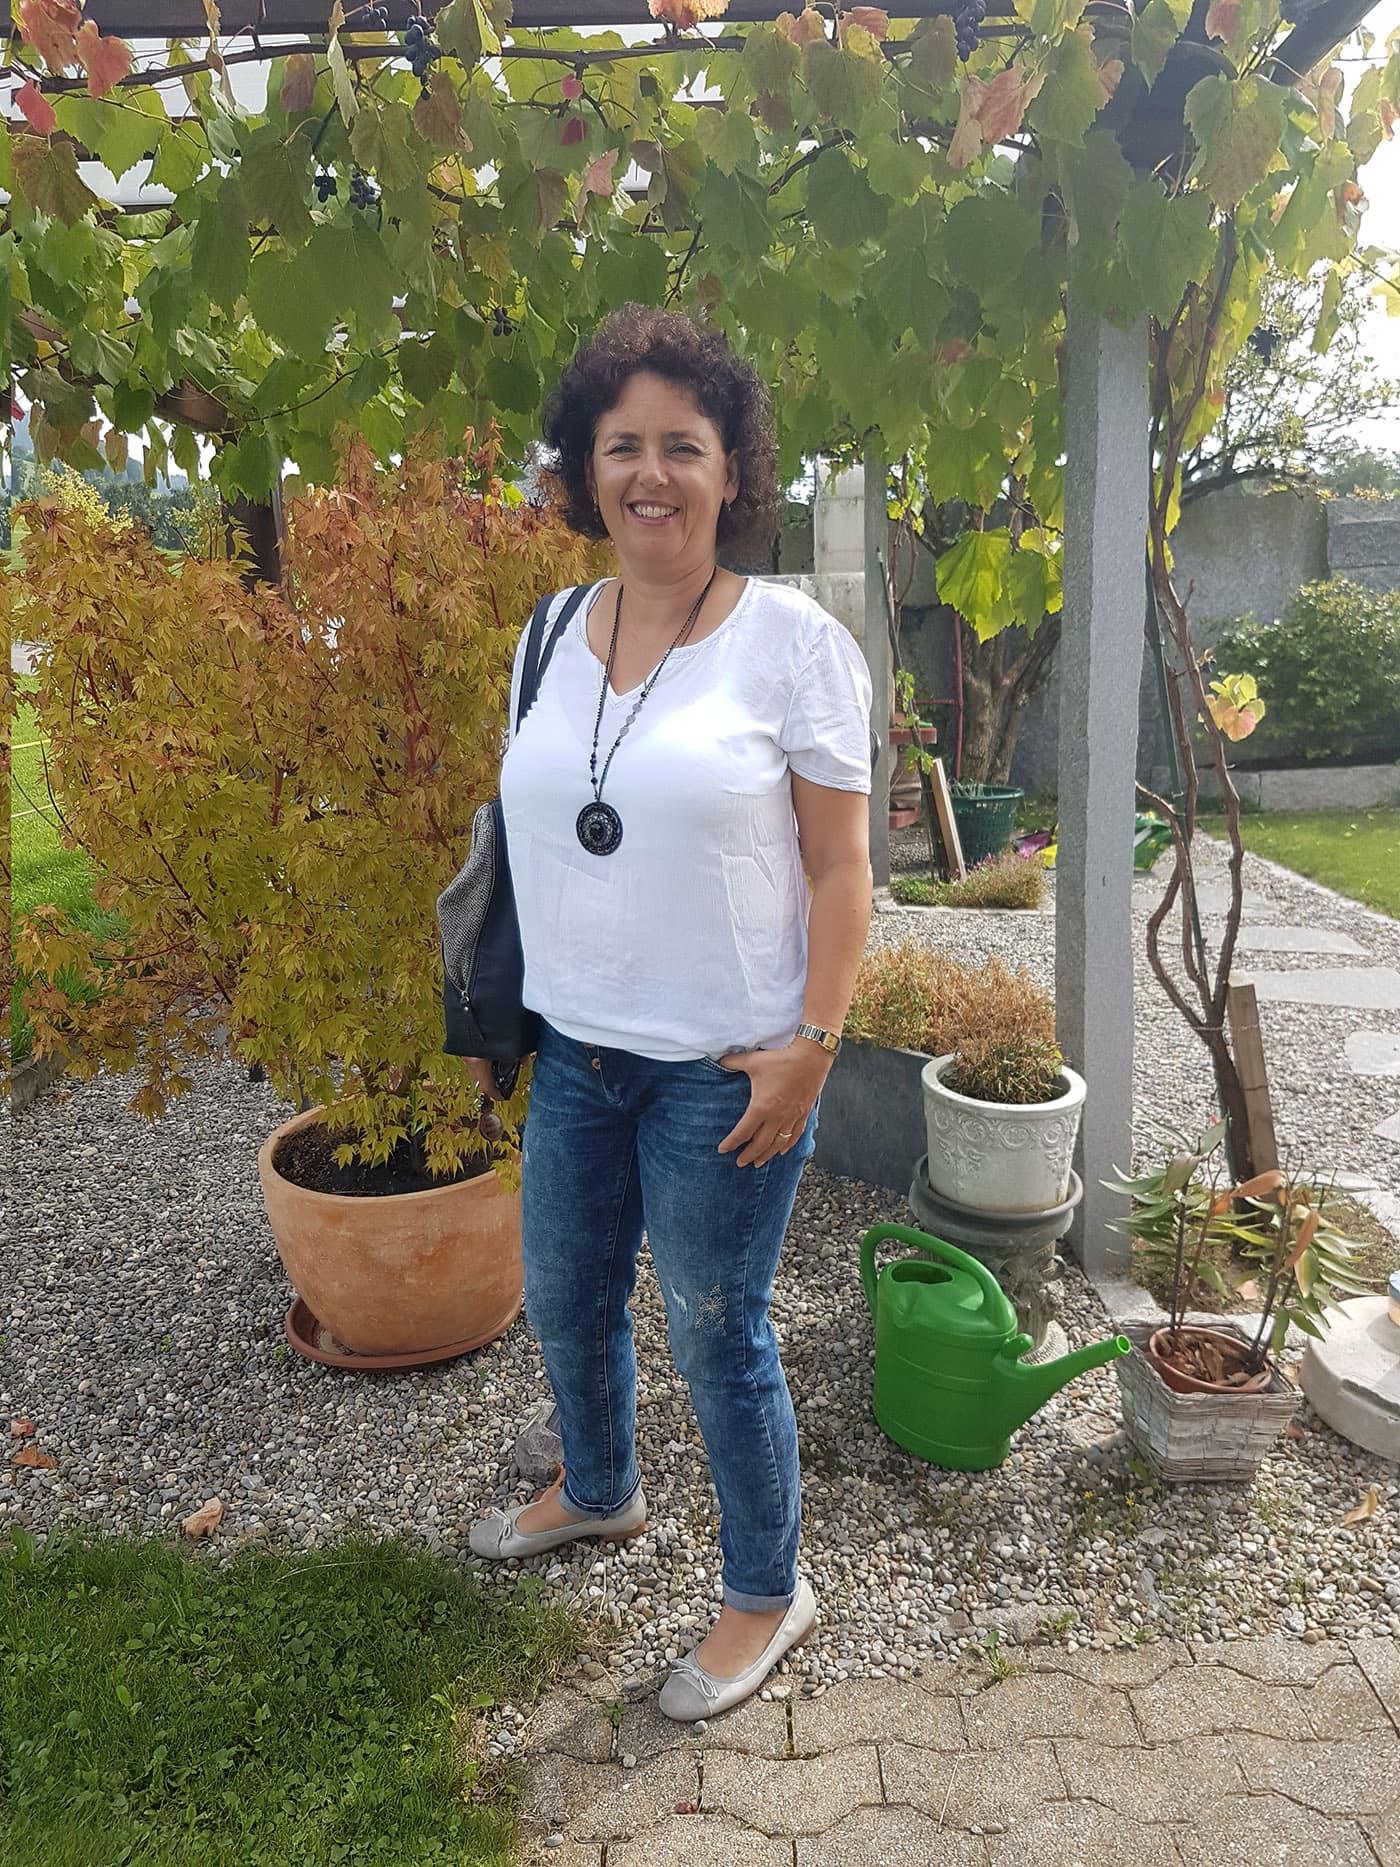 Fahrlehrerin Claudia Guerrini - Fahrschule Driving Point in Rapperswil